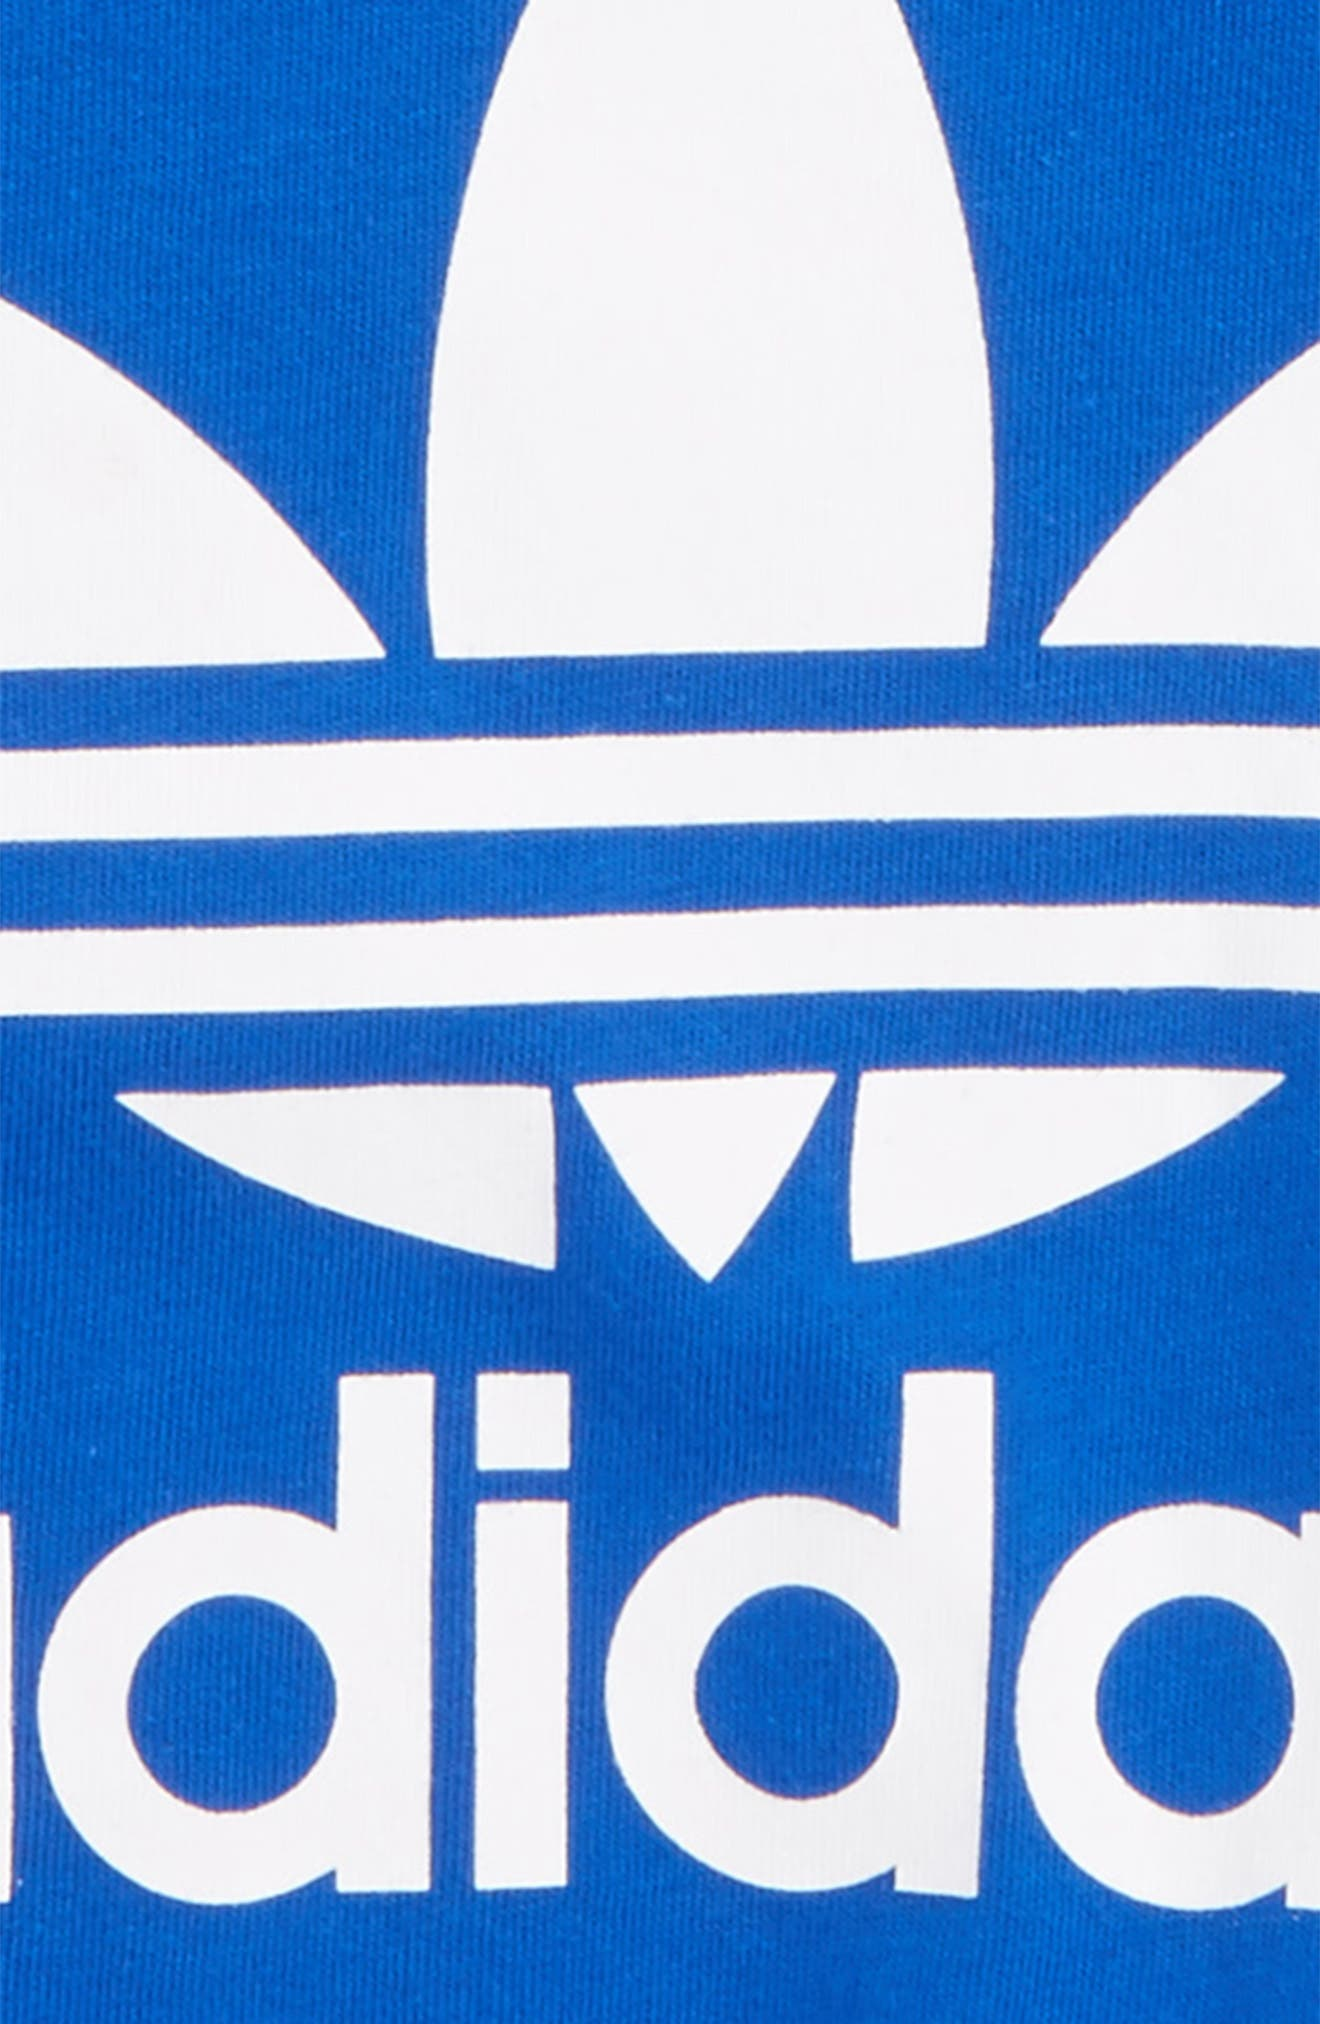 Originals Trefoil Logo T-Shirt,                             Alternate thumbnail 2, color,                             Blue. White